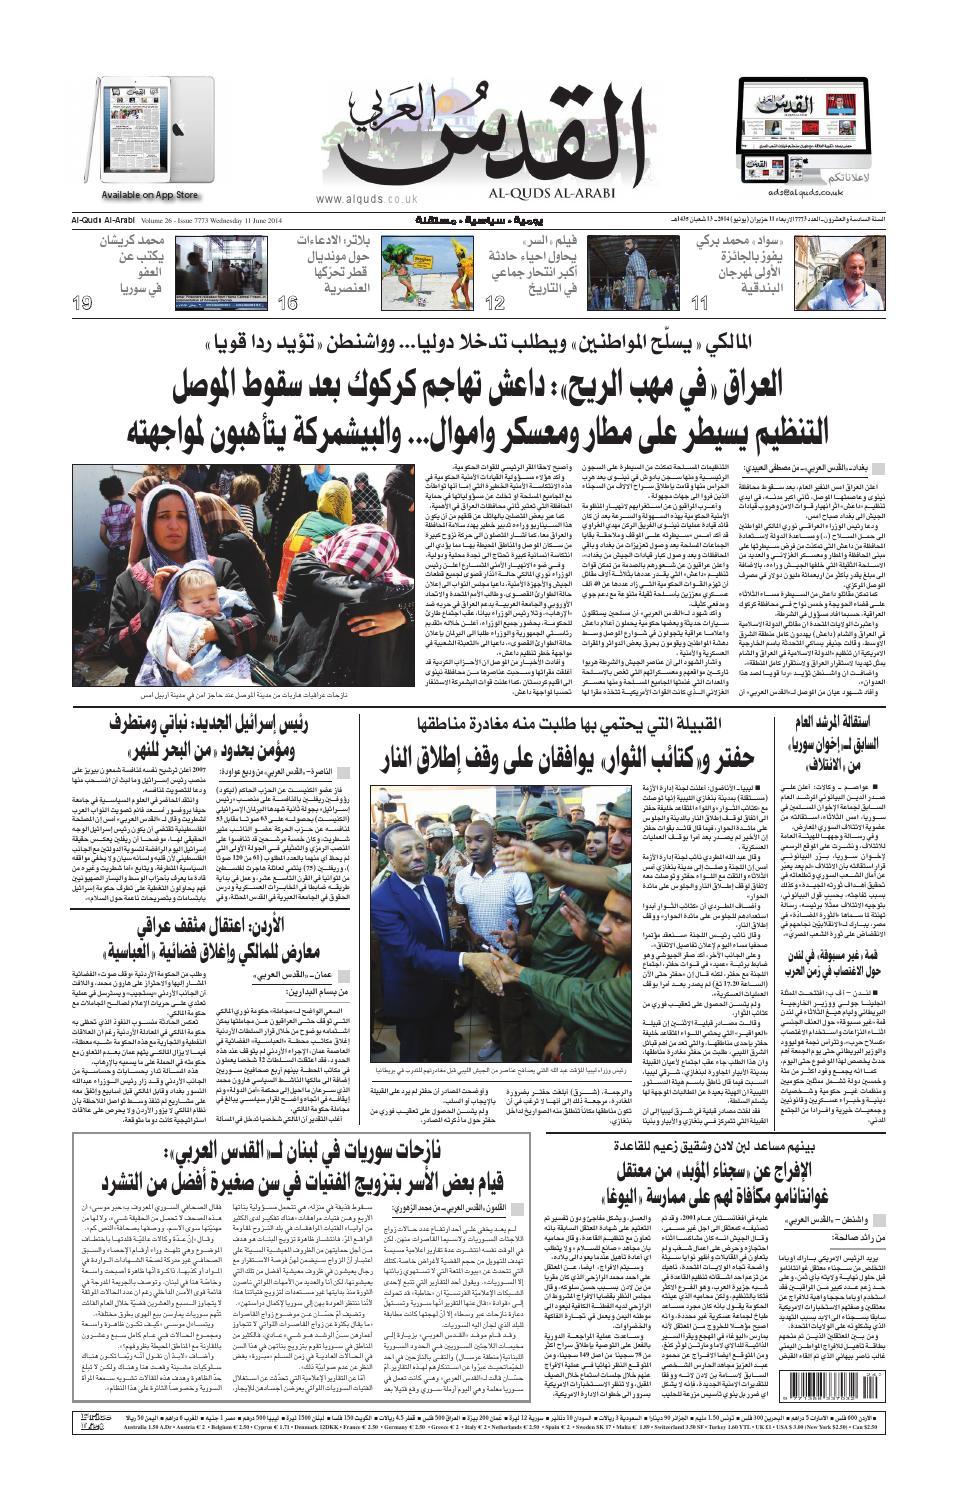 8df411fc7 صحيفة القدس العربي , الأربعاء 11.06.2014 by مركز الحدث - issuu